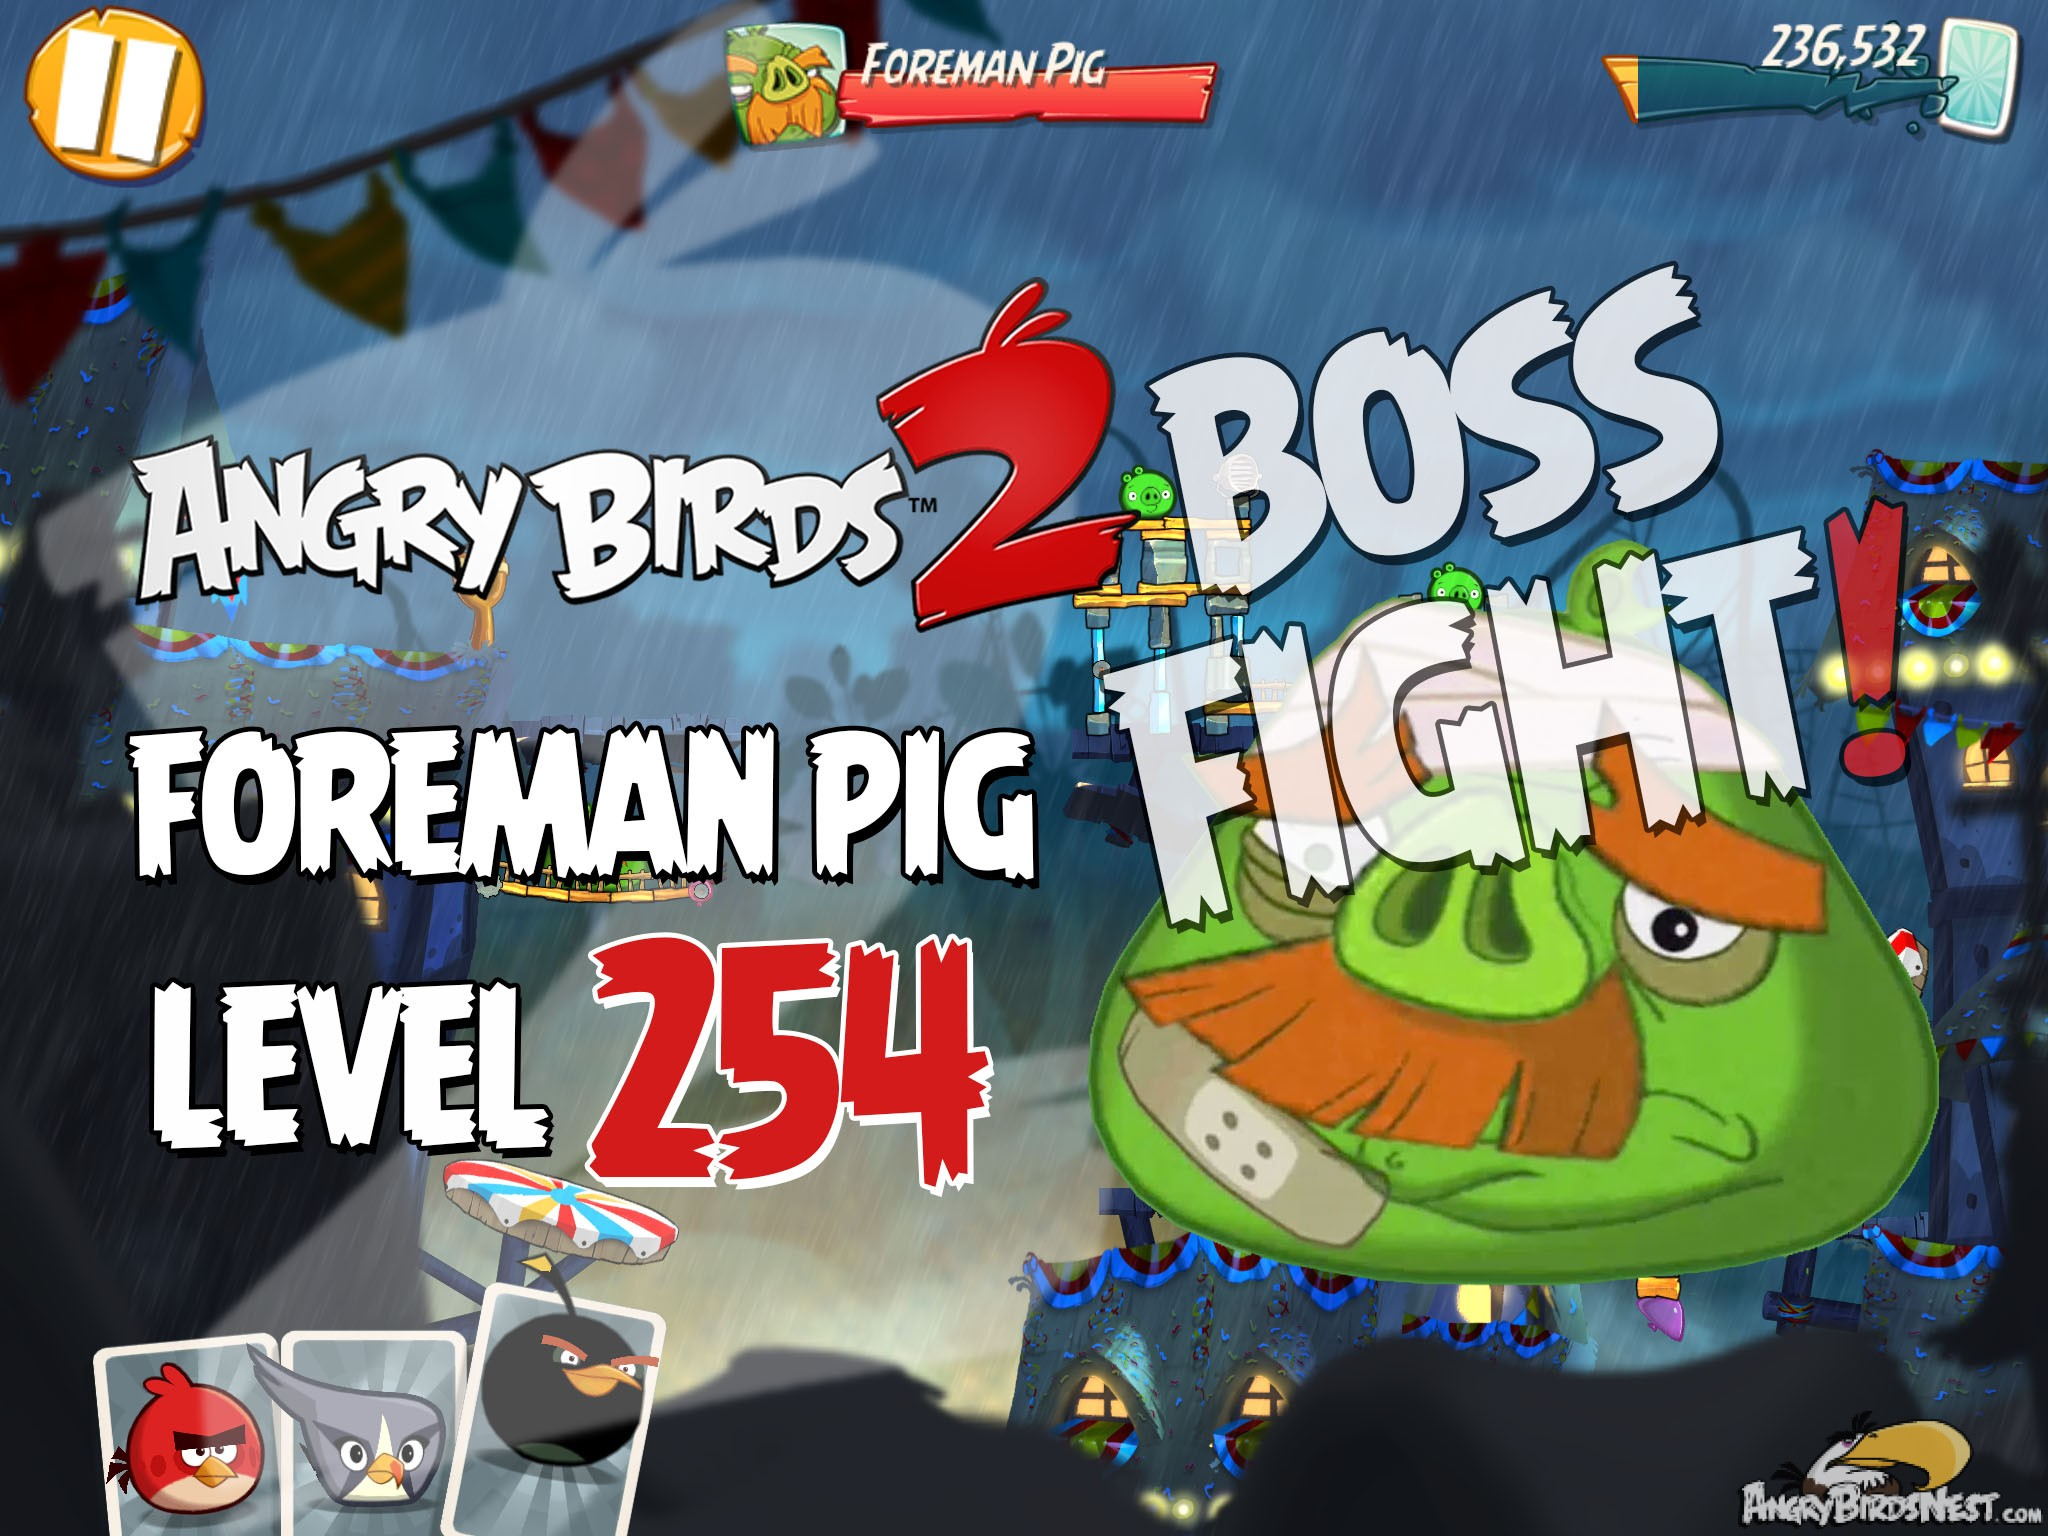 Angry Birds 2 Foreman Pig Level 254 Boss Fight Walkthrough